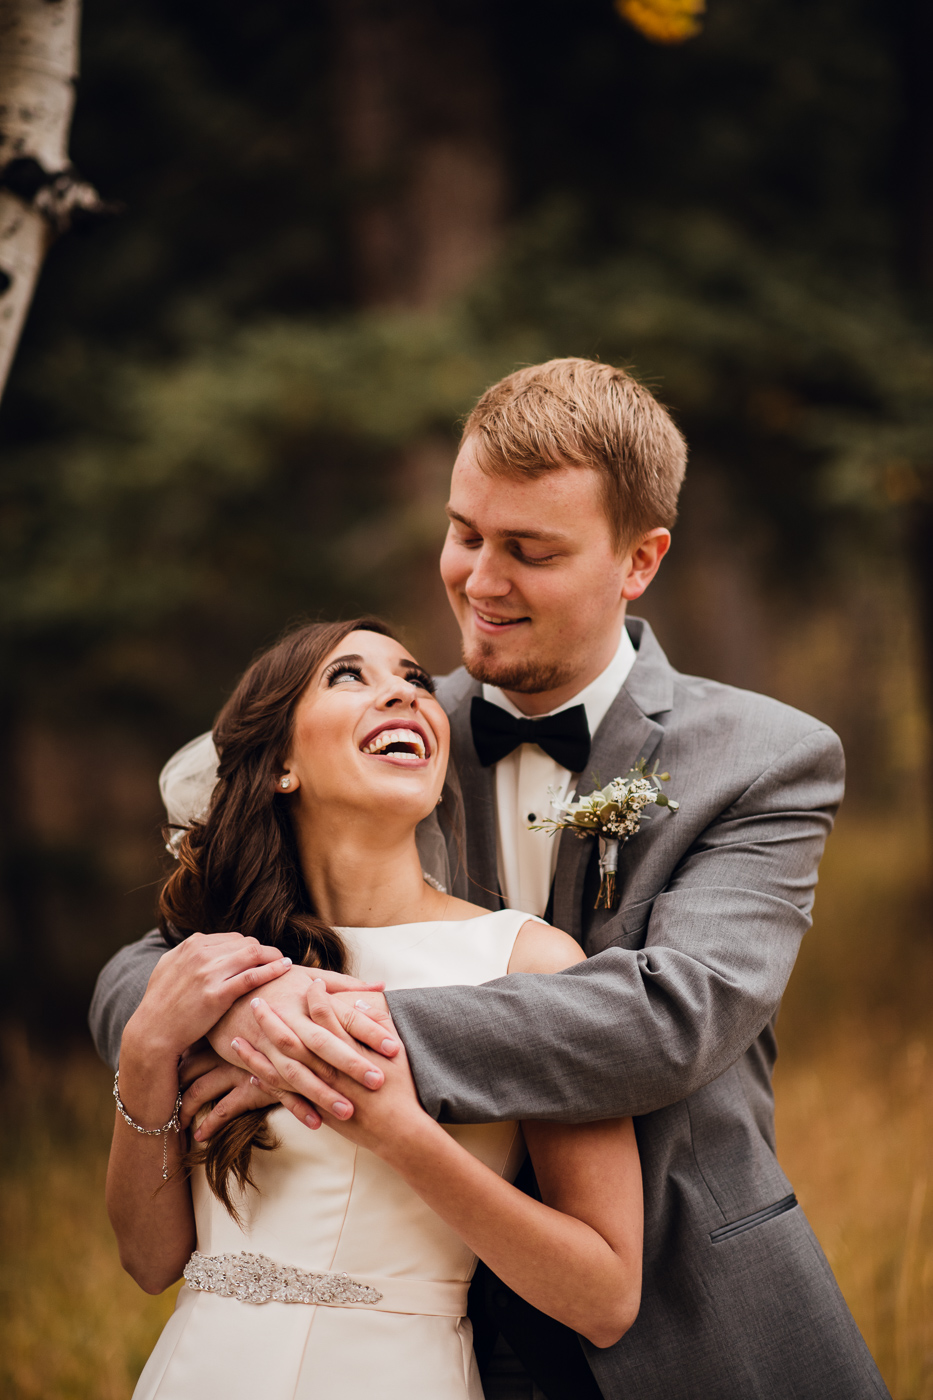 Candice Rawlin Wedding PHOCO Photography Pines Genesee Golden Colorado Fog -15.jpg